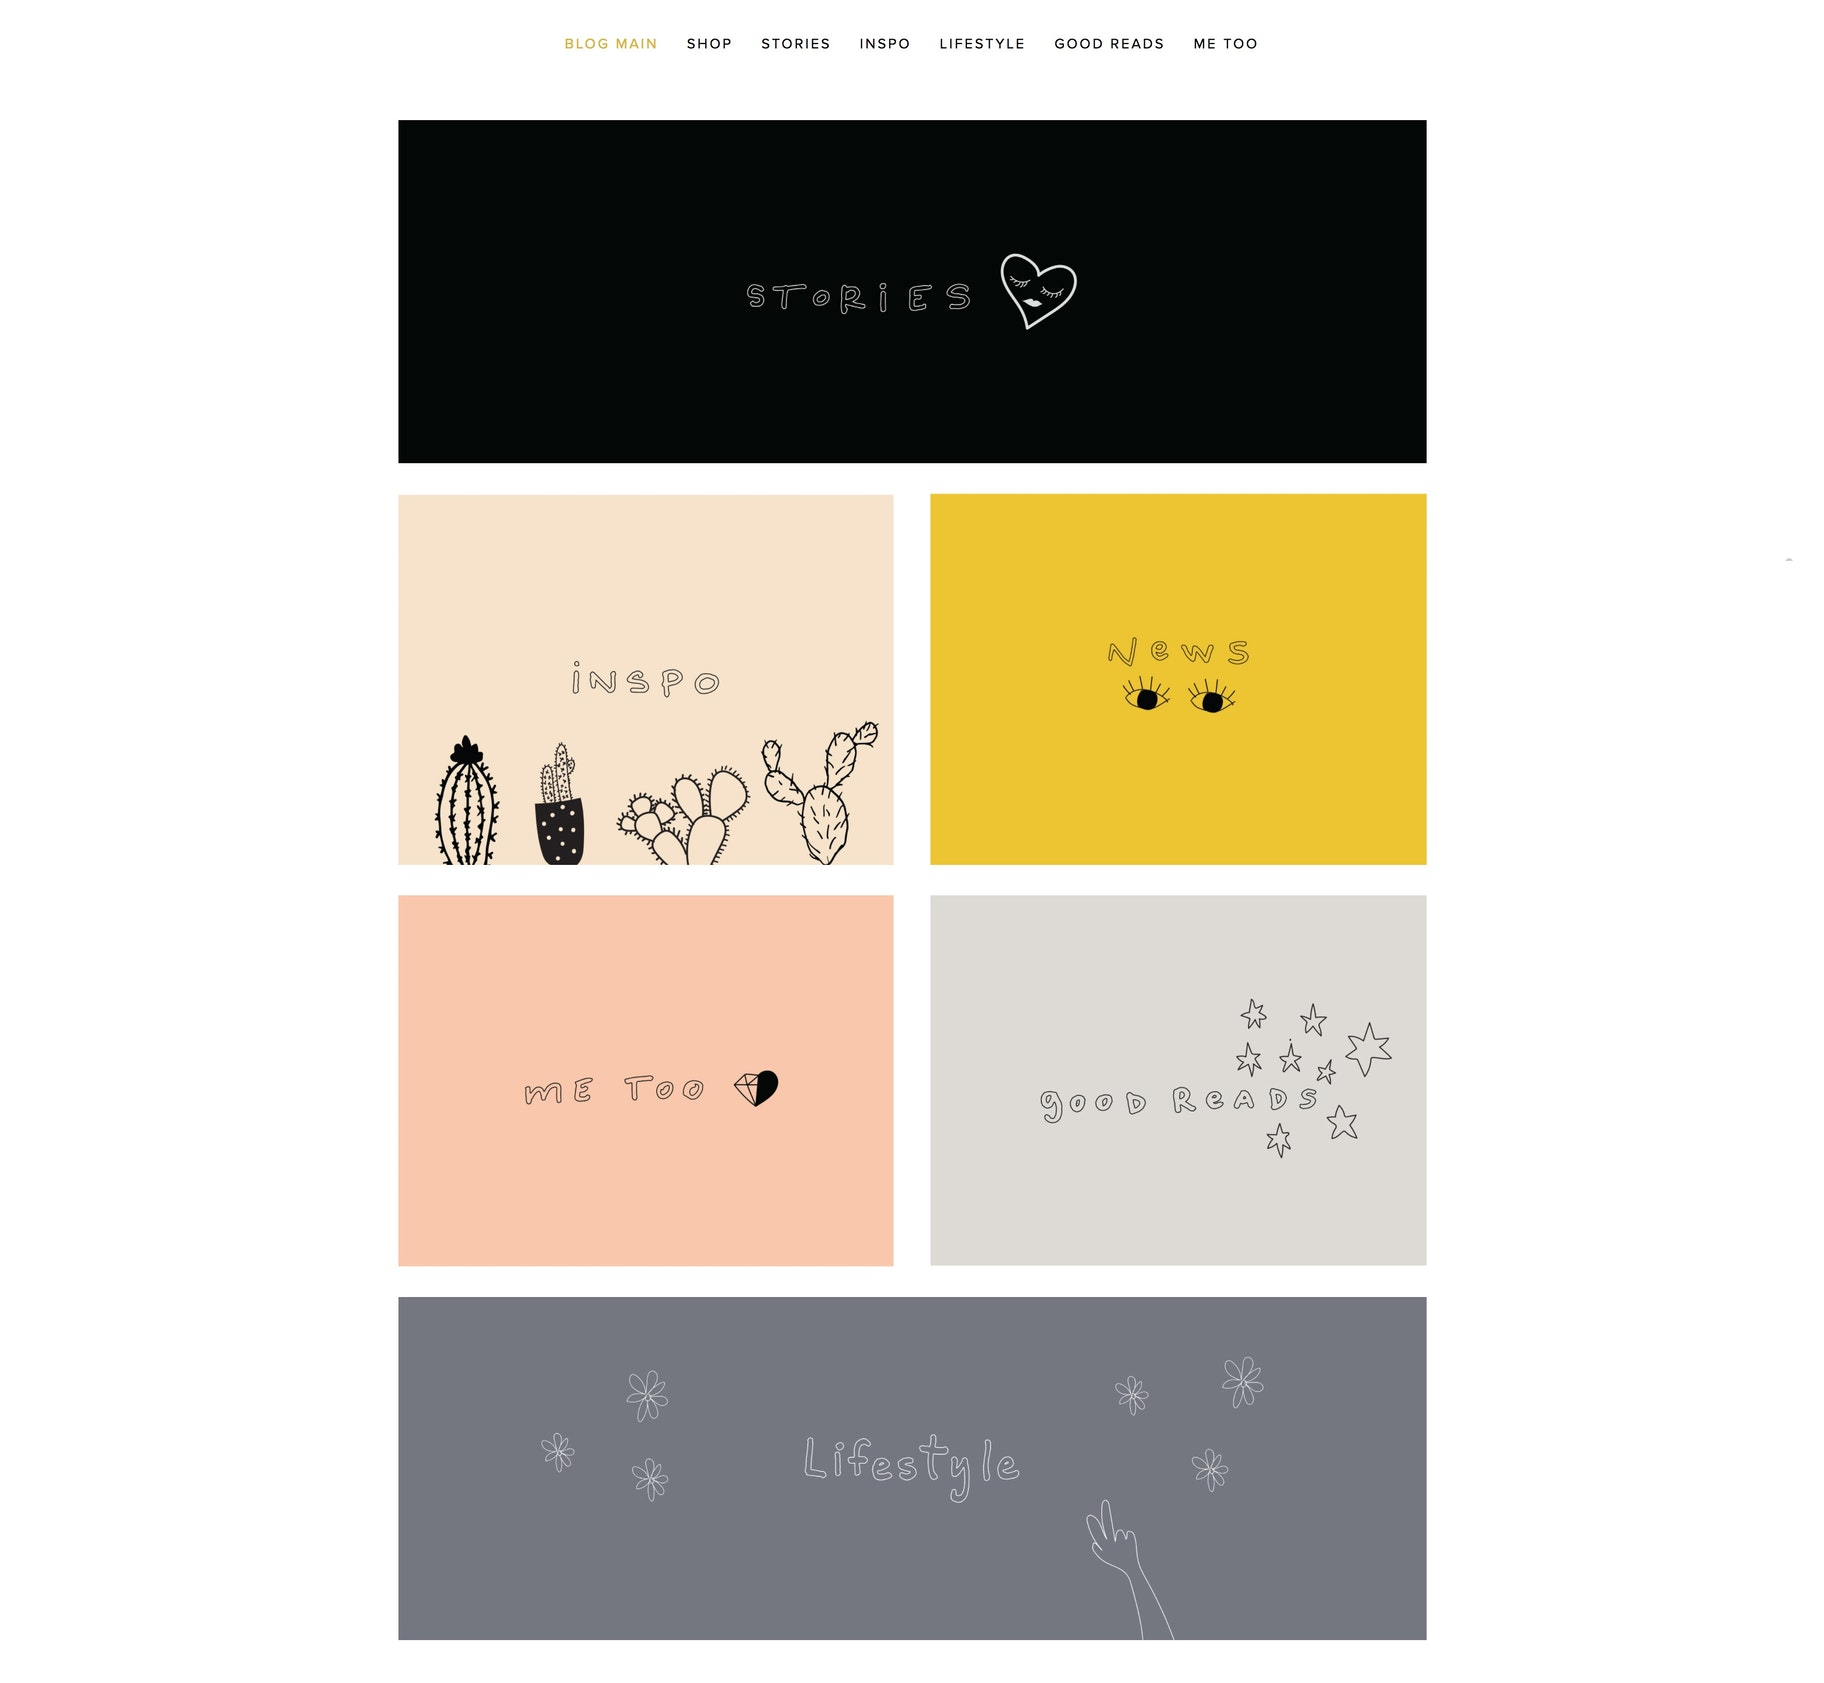 nice blog design